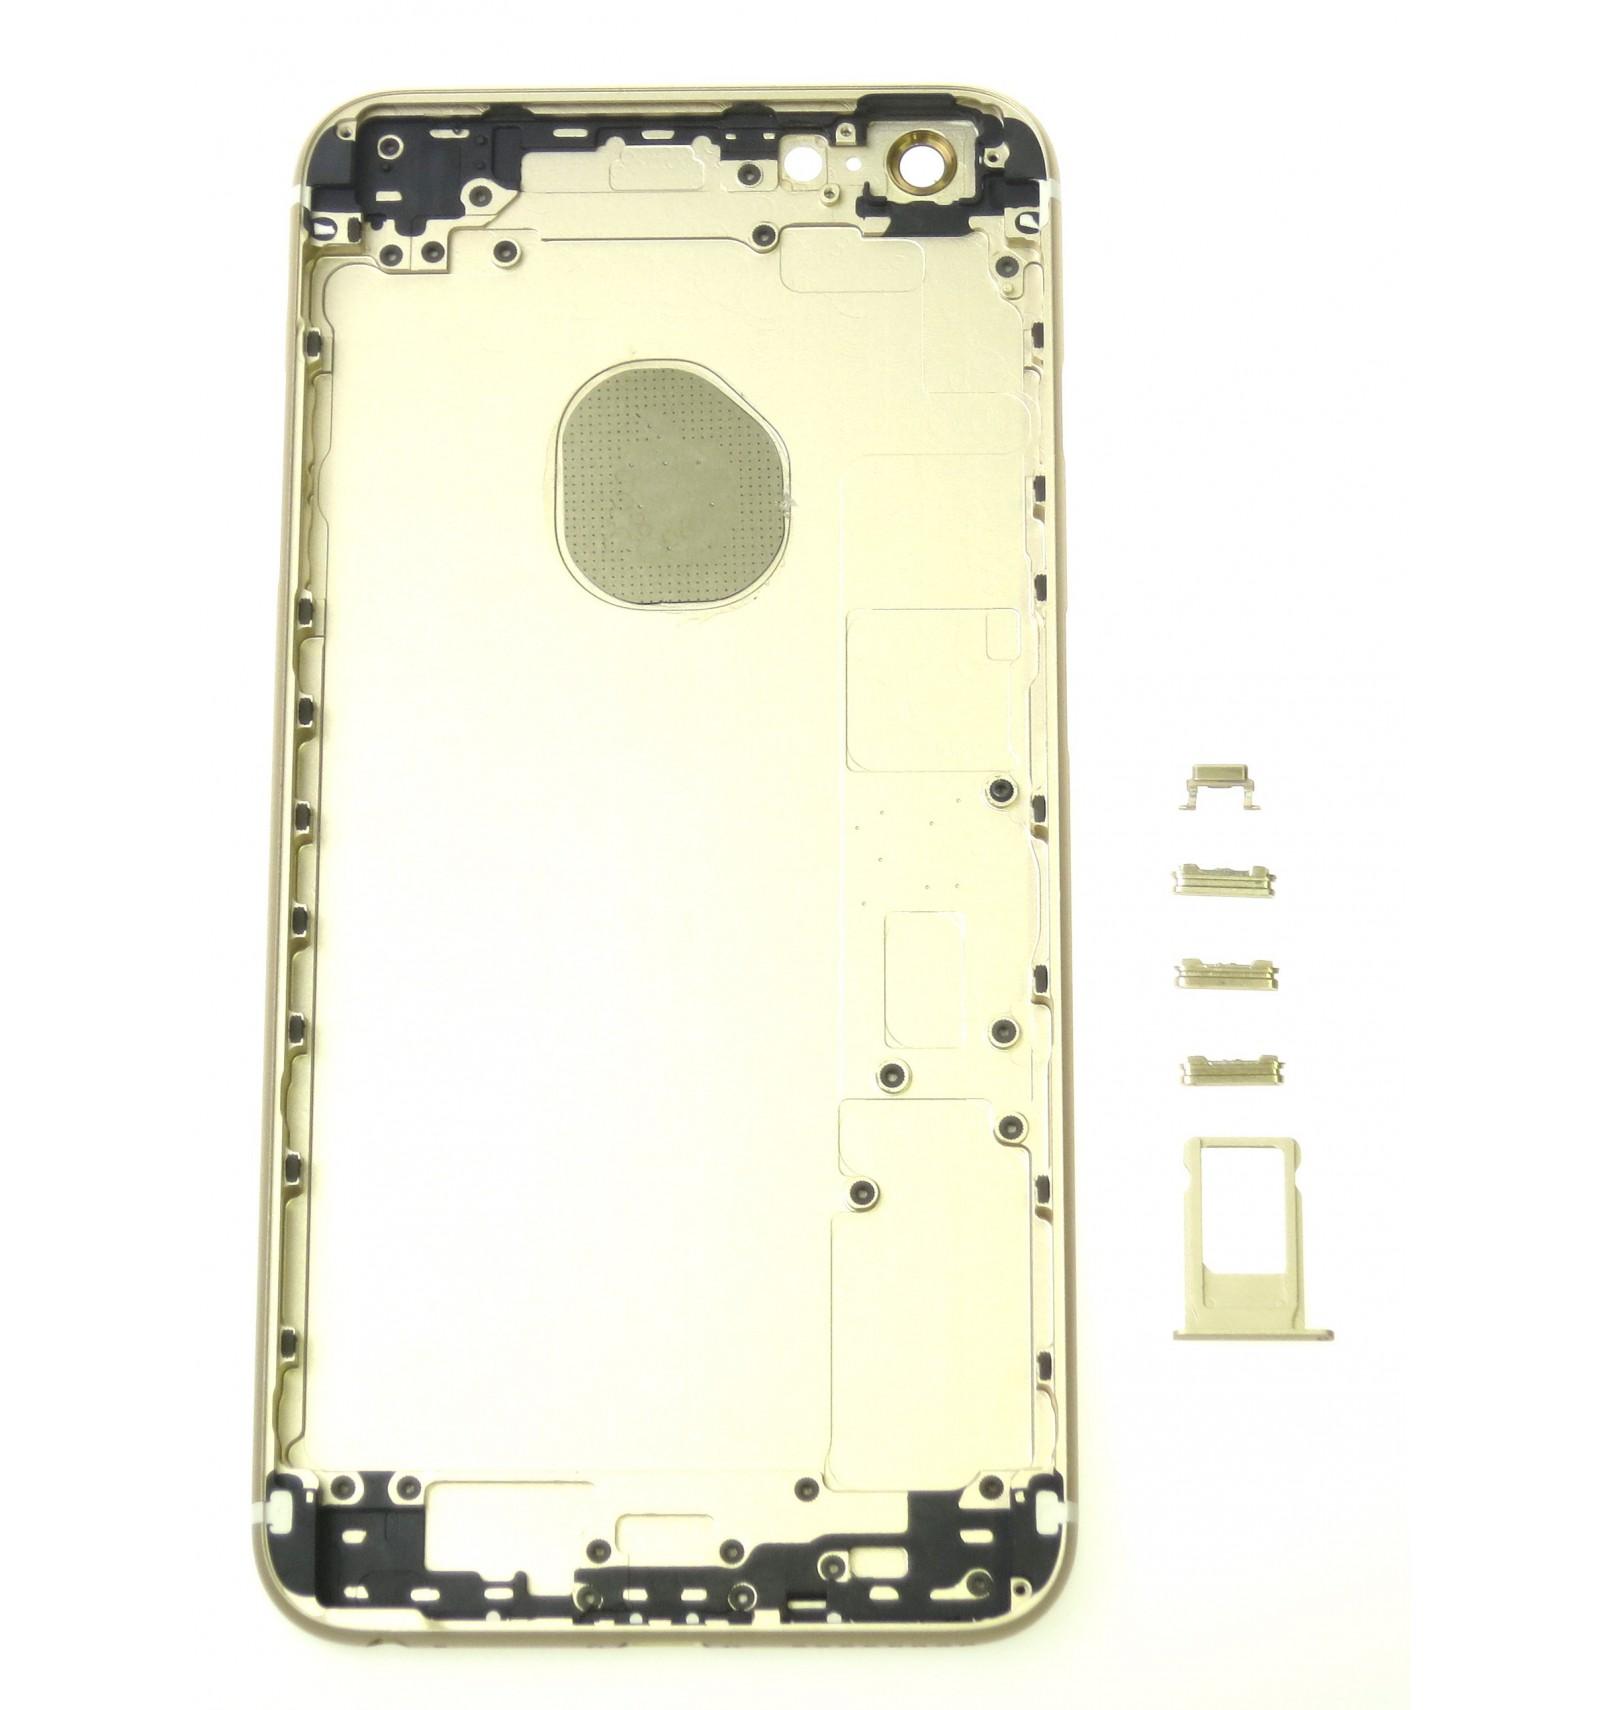 Kryt zadný zlatá náhrada na Apple iPhone 6s Plus  3c6a47da689